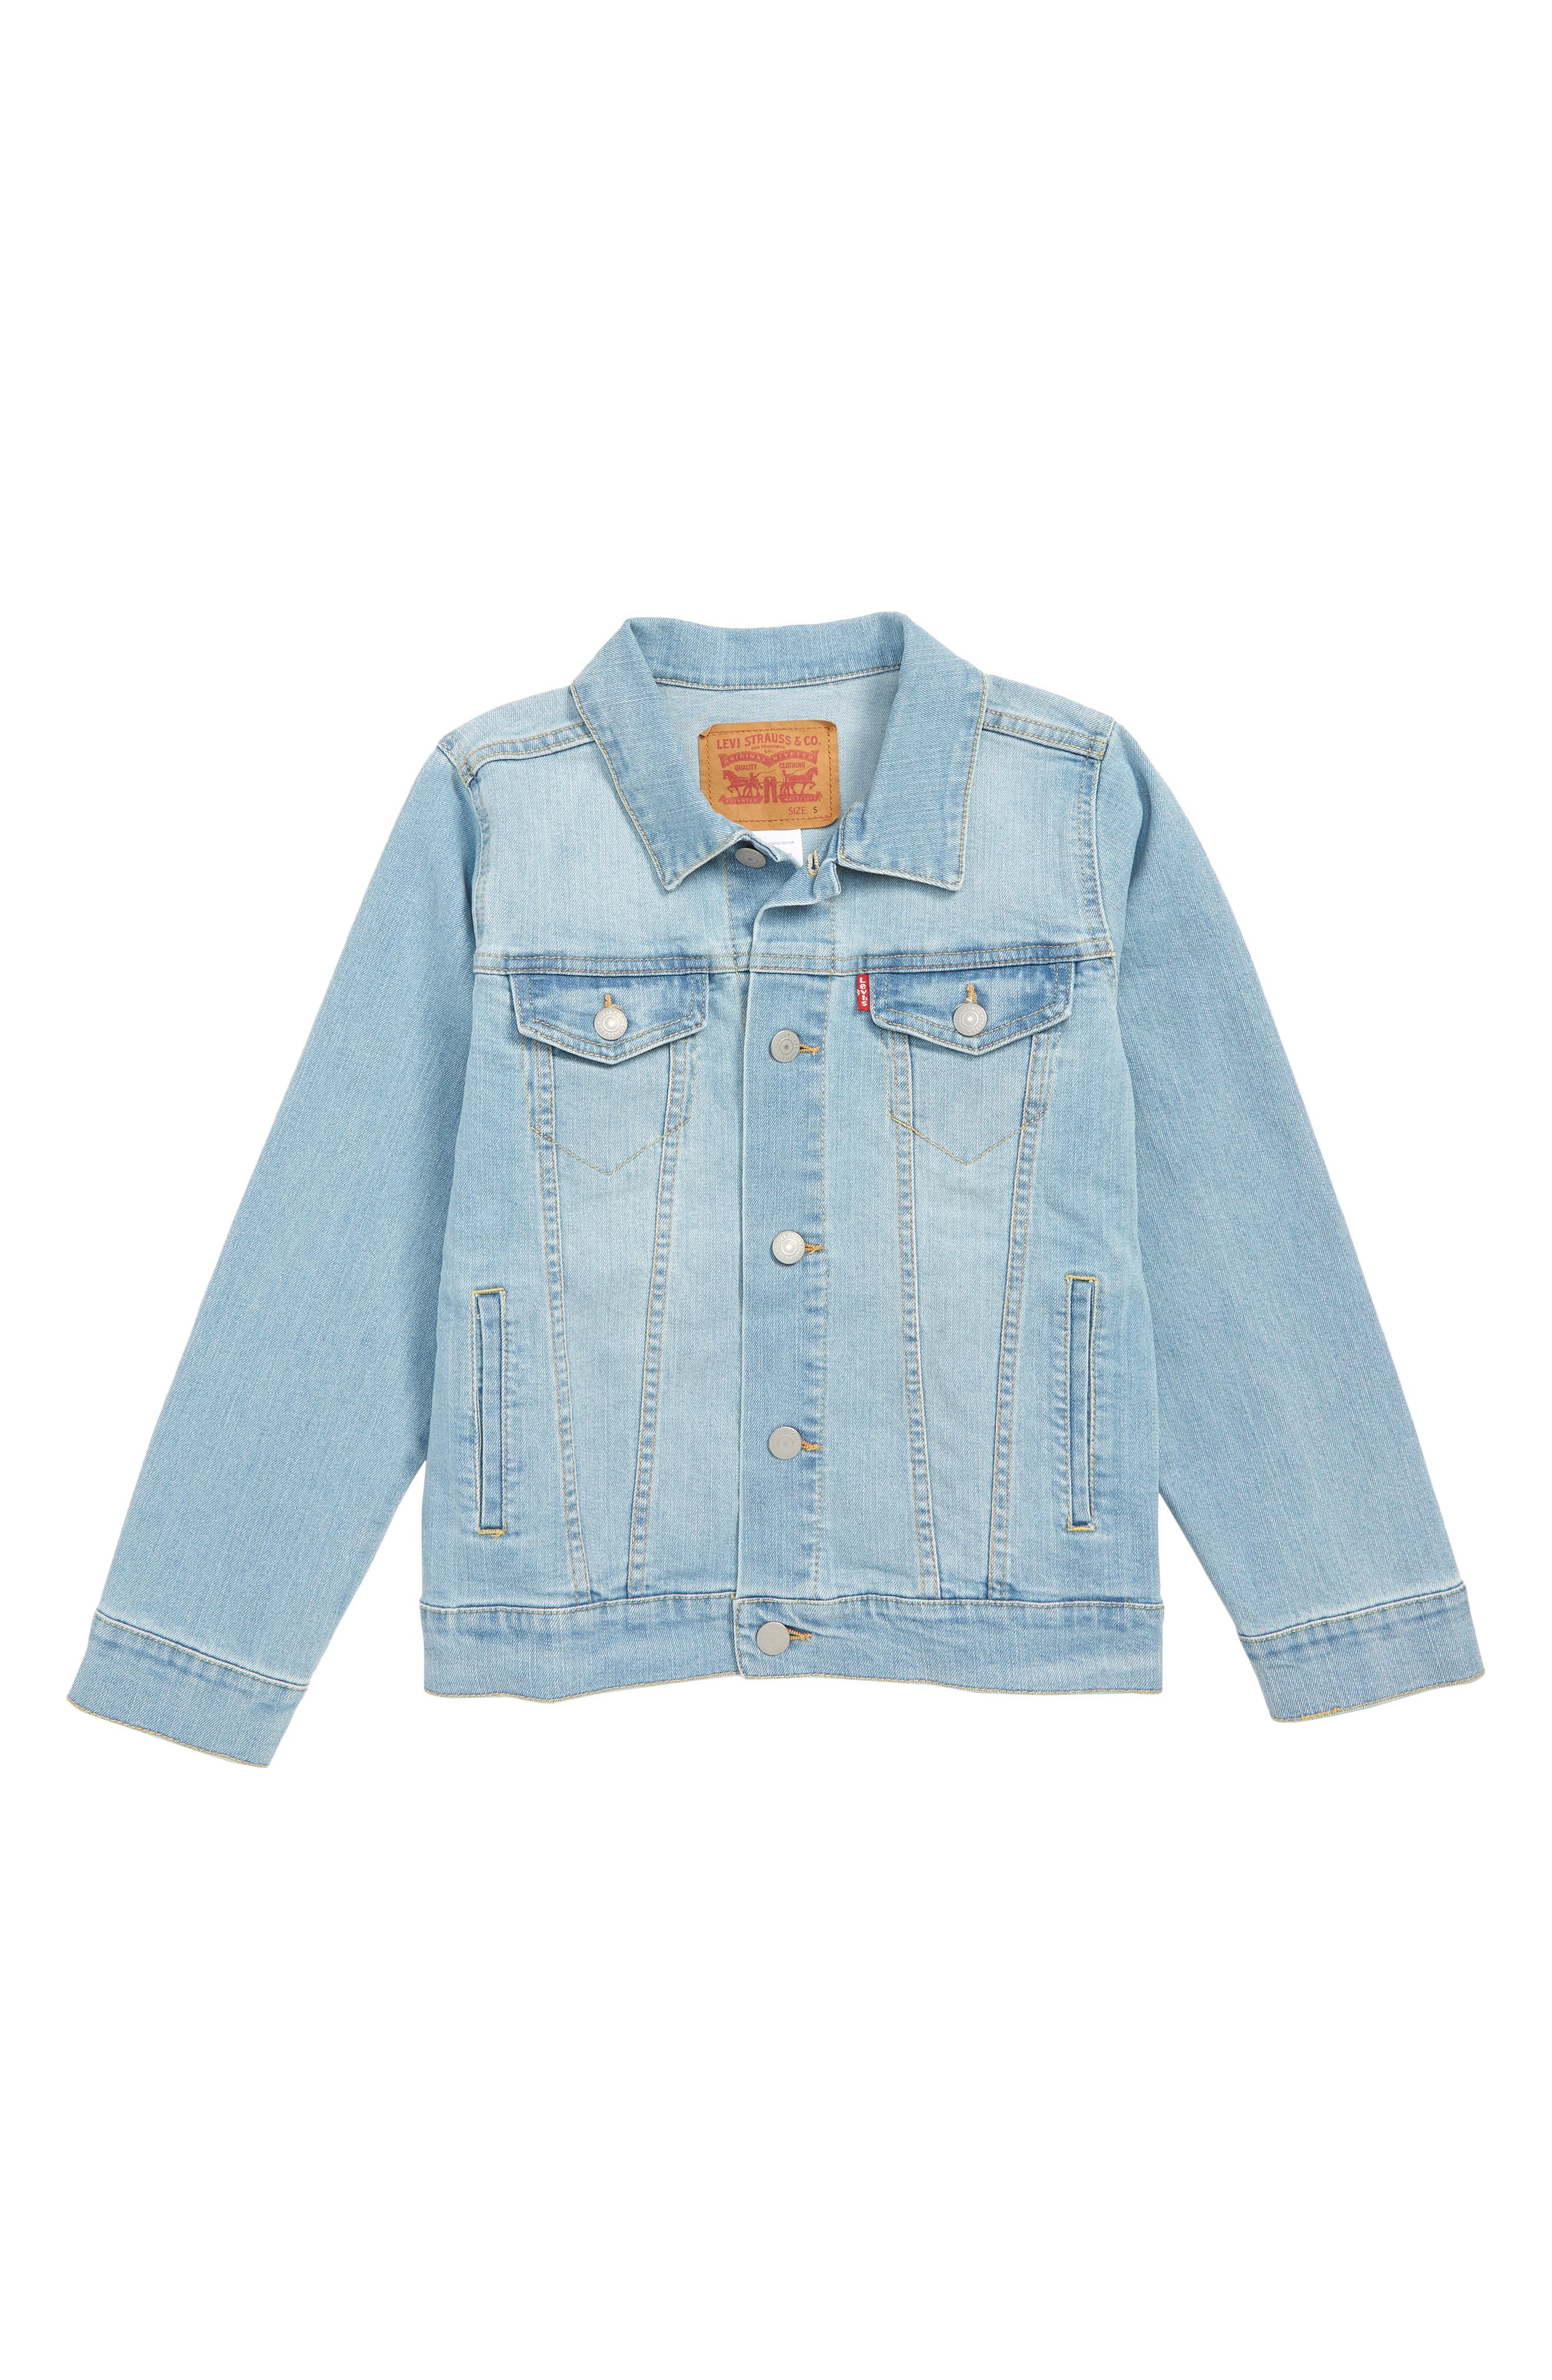 LEVI'S<SUP>®</SUP> Trucker Denim Jacket, Main, color, YOSEMITE FALLS